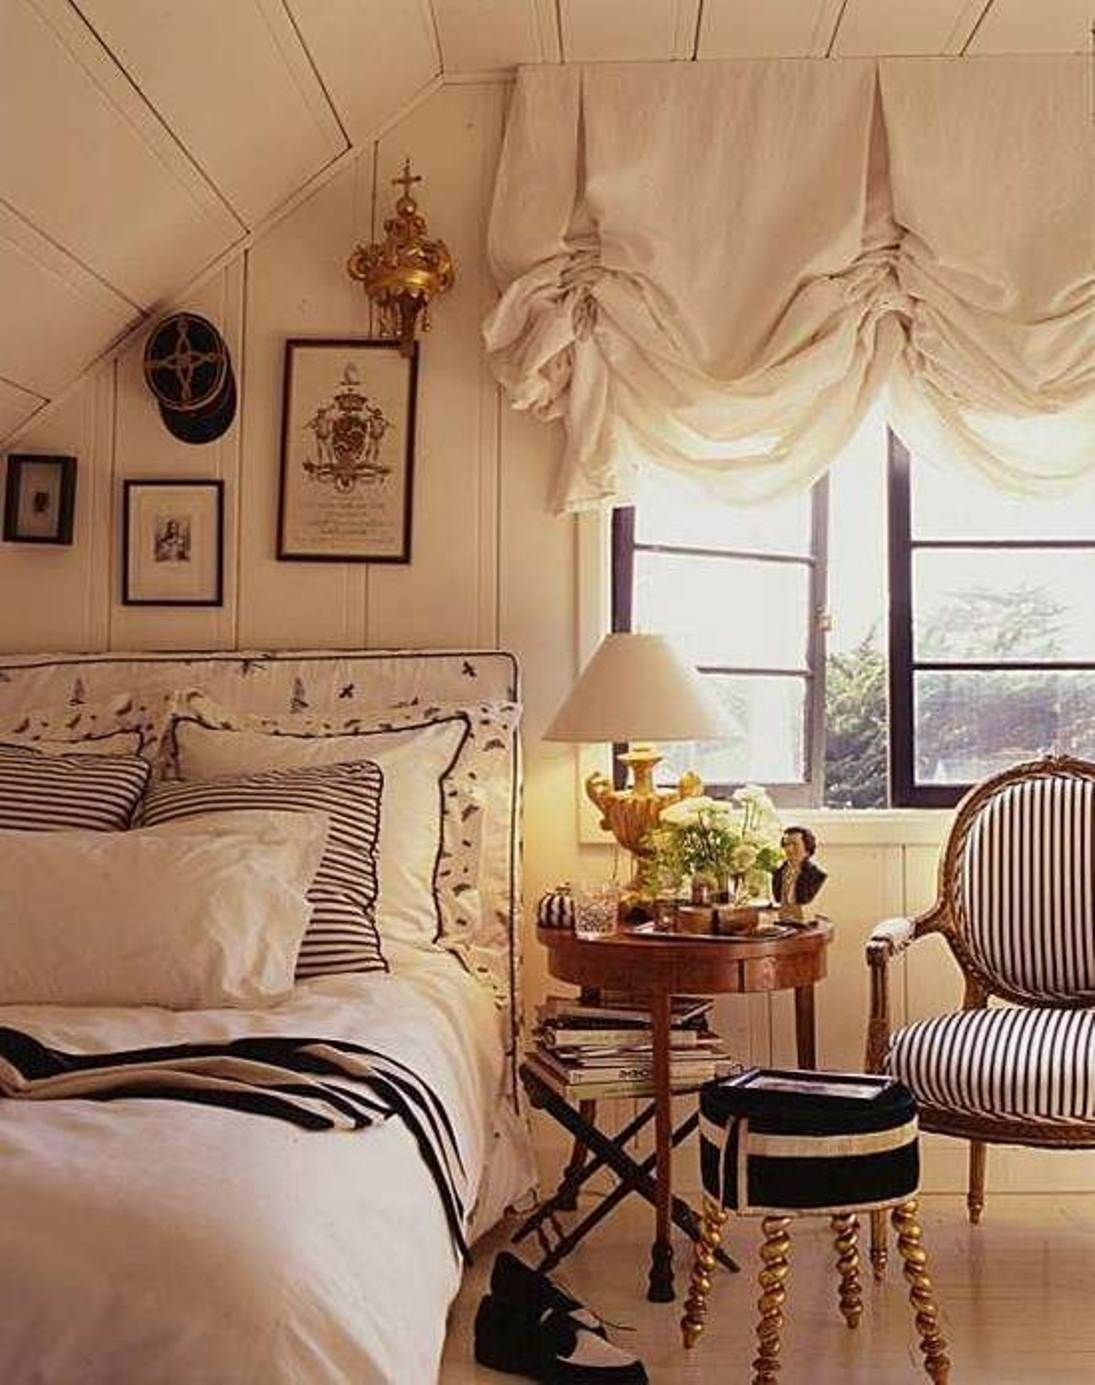 Popular window treatments for bedrooms better home and - Most popular window treatments ...